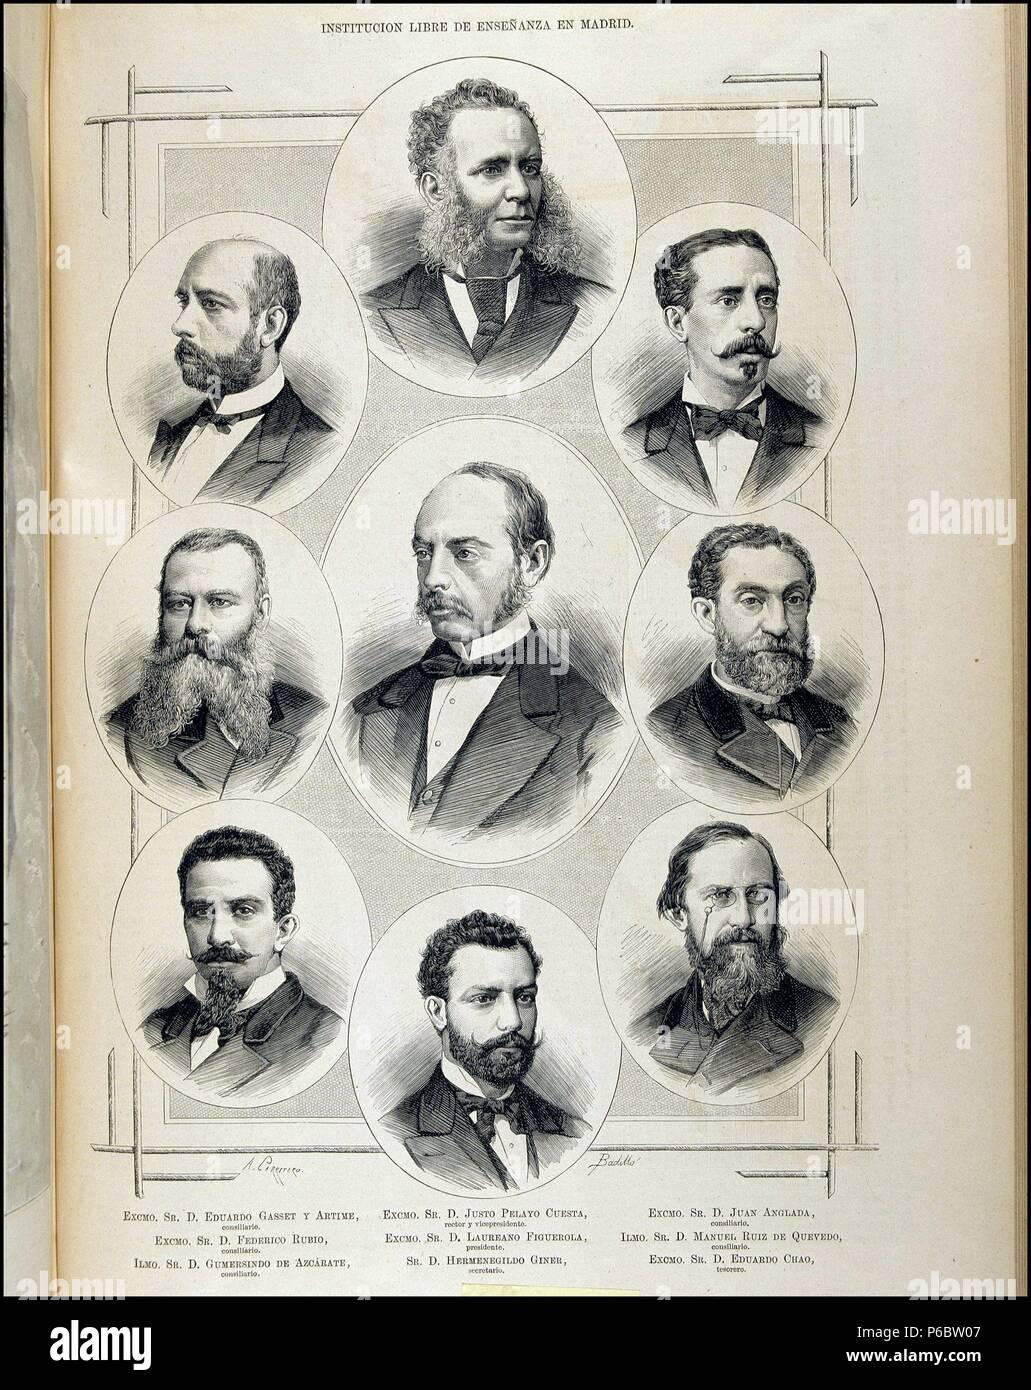 "FIGUEROLA, LAUREANO. Politisch ESPAÑOL. CALAFAF 1816 - 1903. ""INSTITUCION  LIBRE DE"